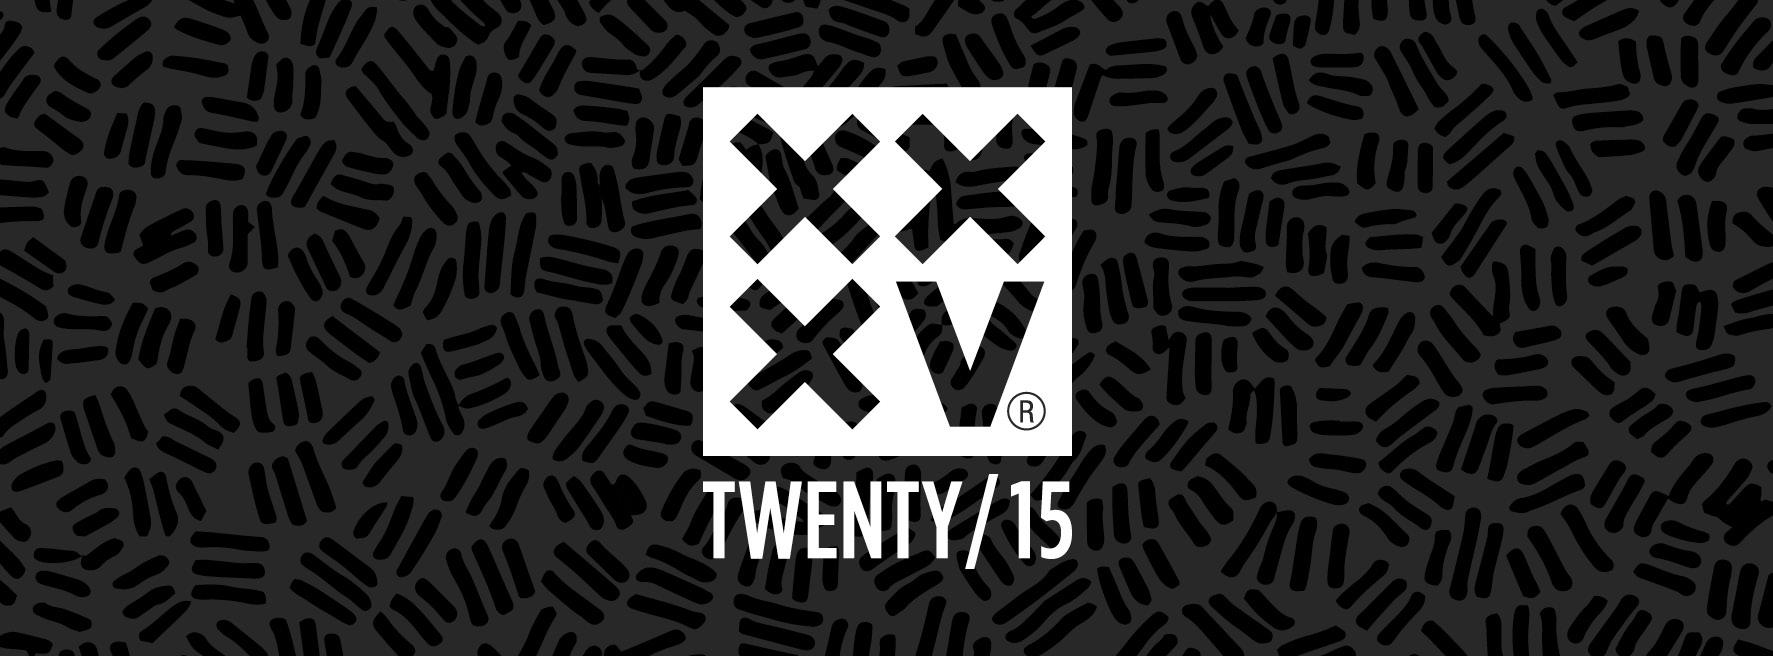 Twenty/15